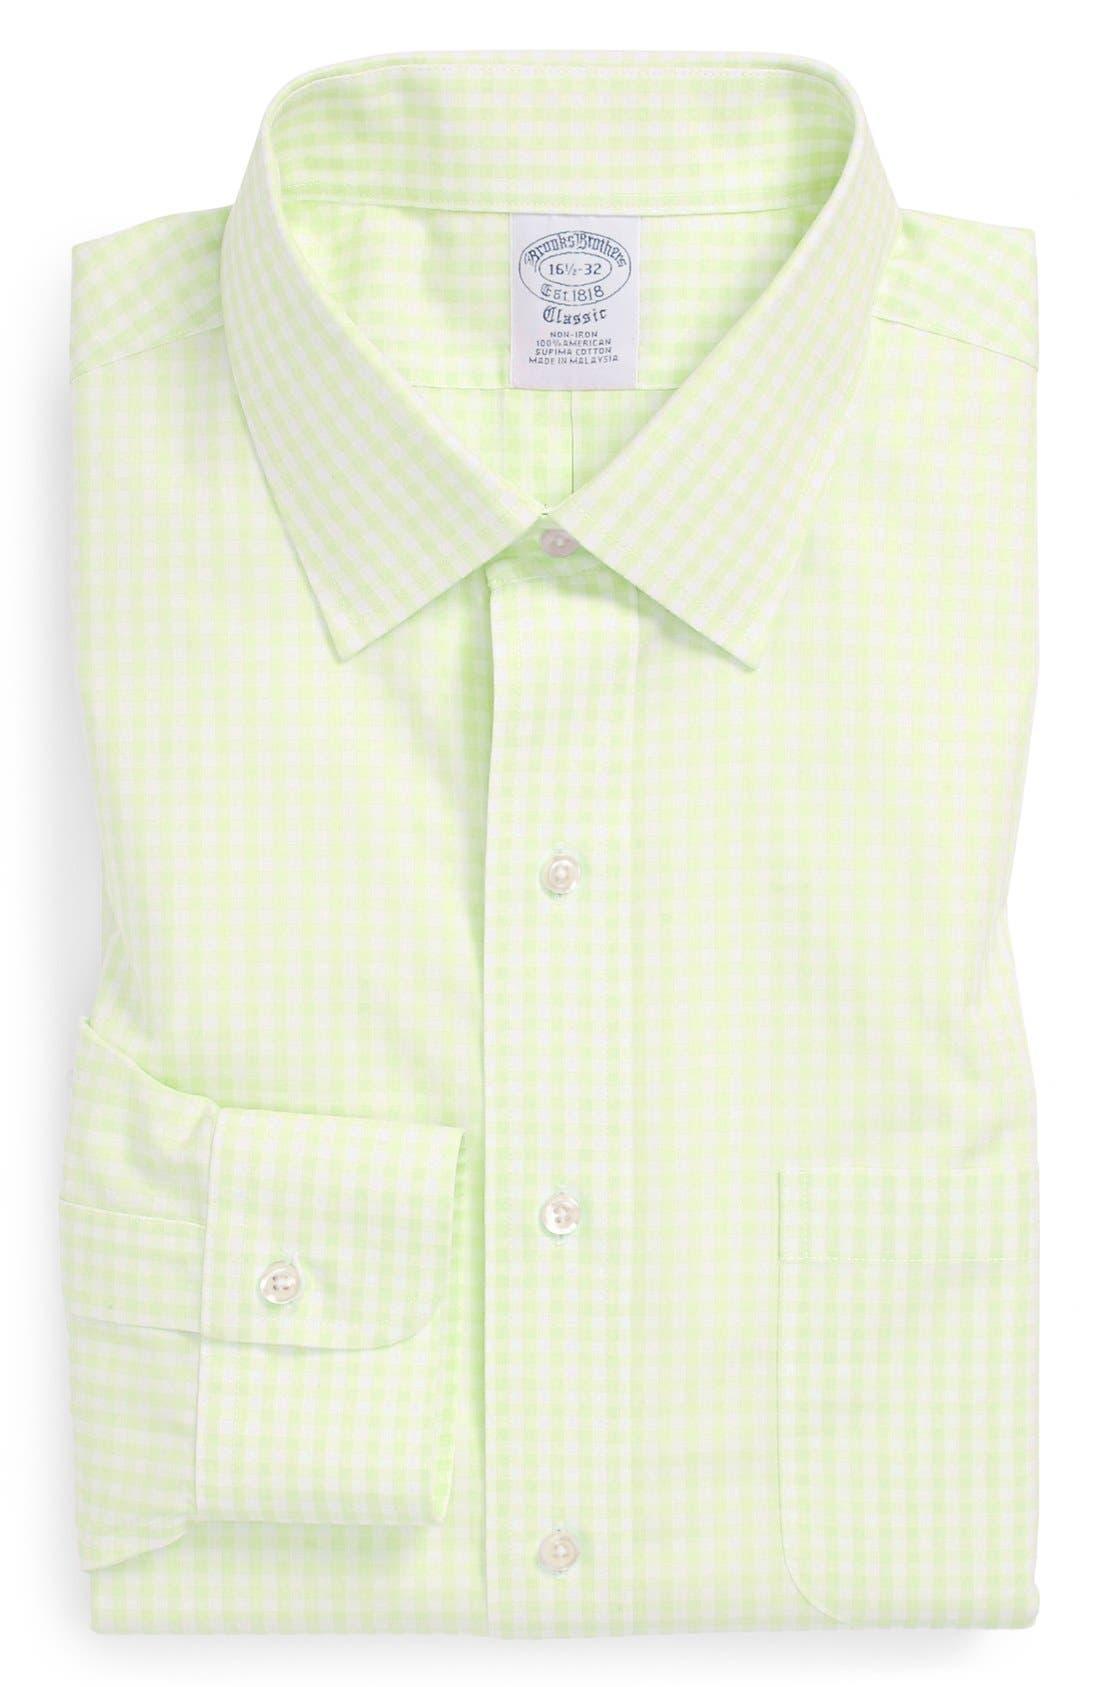 Main Image - Brooks Brothers Slim Fit Non-Iron Check Dress Shirt